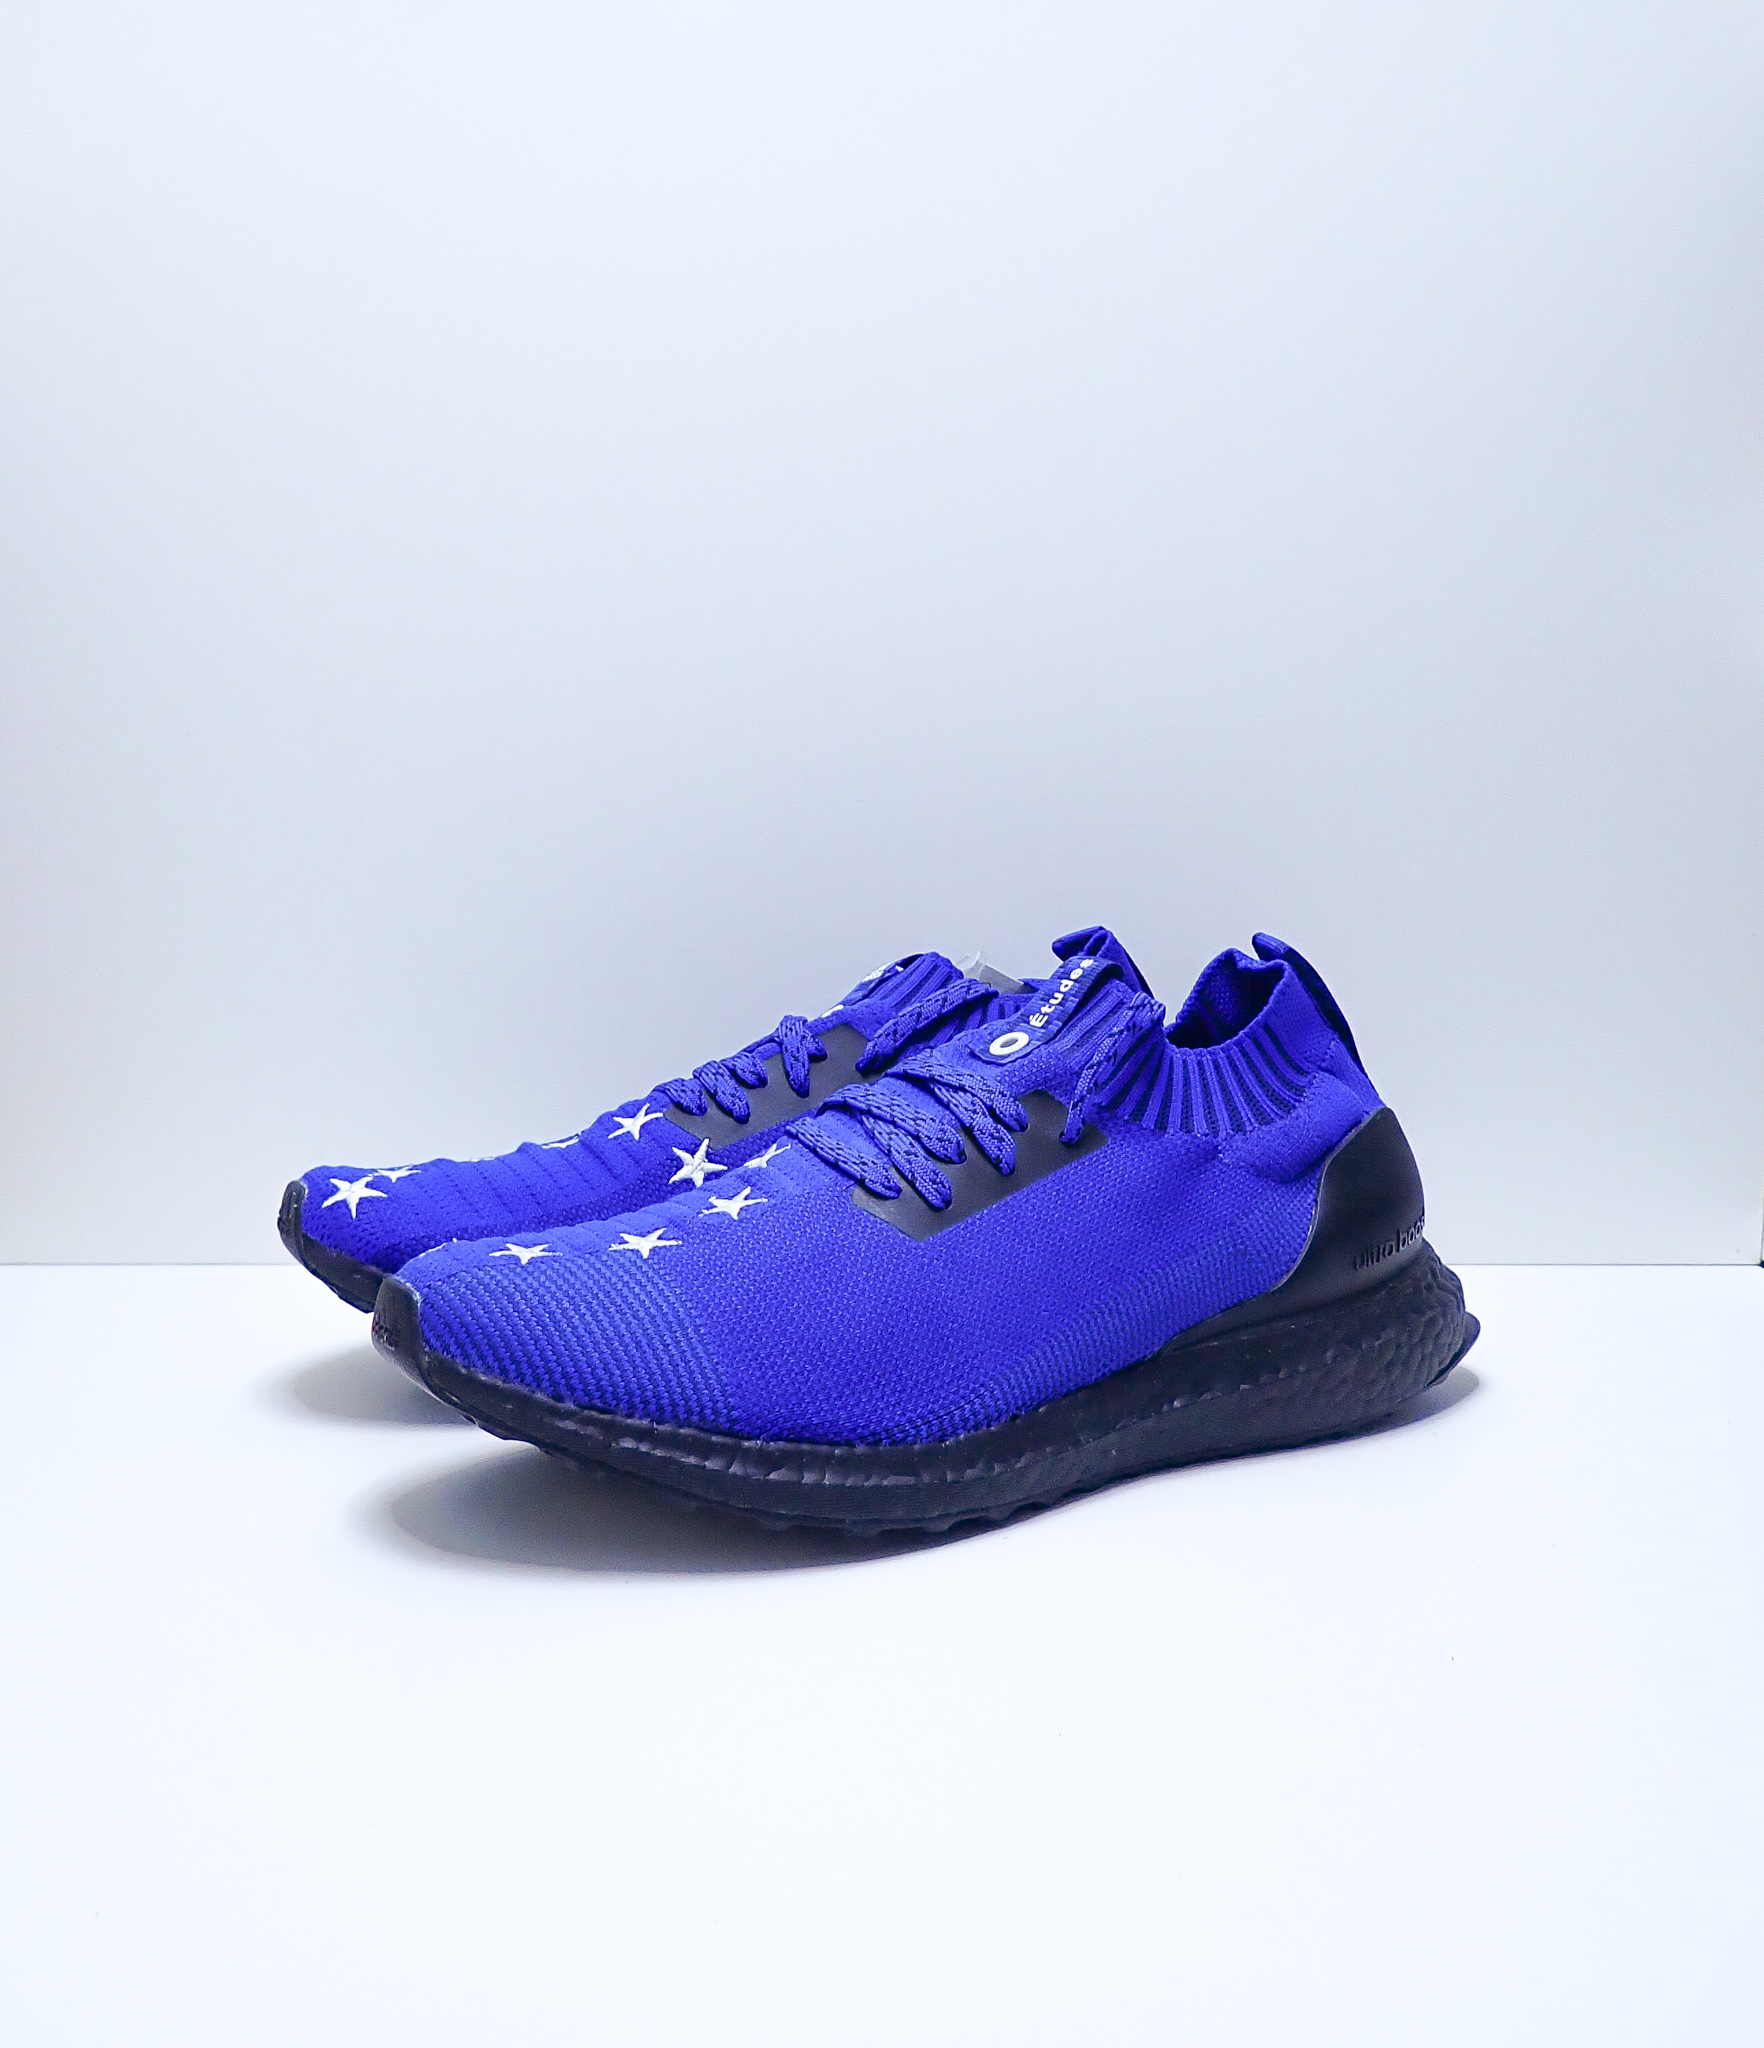 Adidas Ultra boost Uncaged Etudes